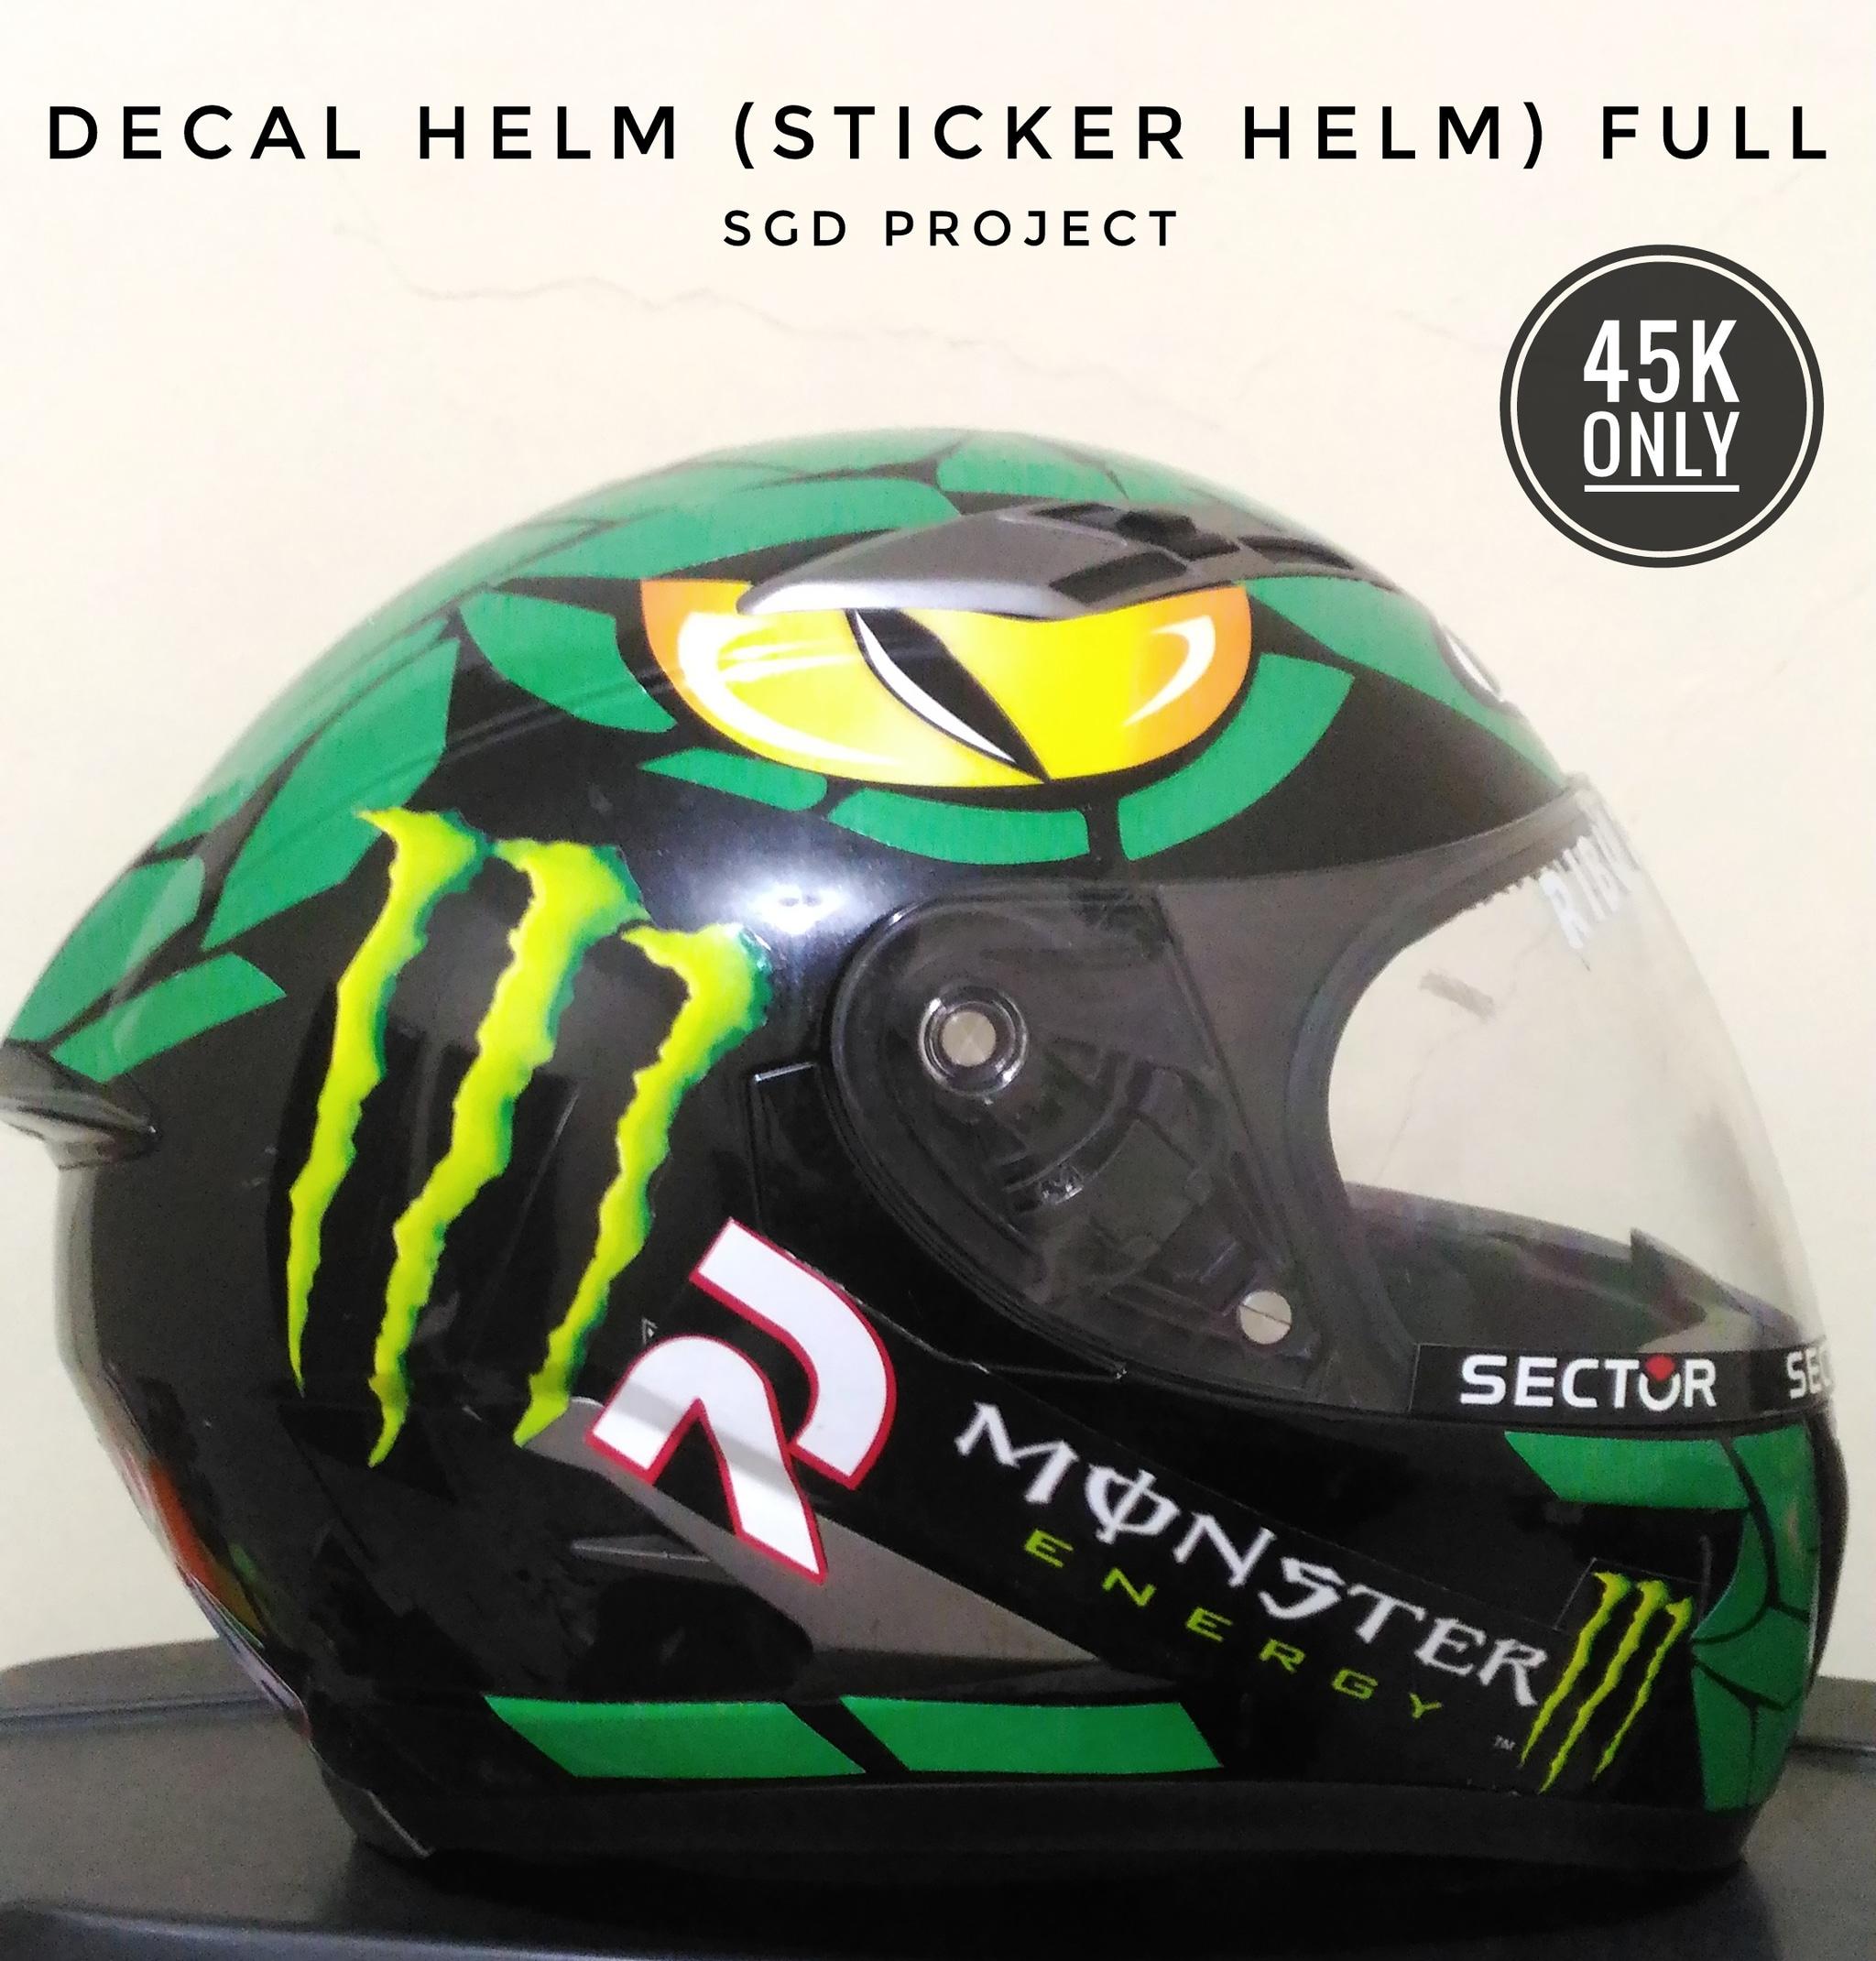 Gambar fang stiker motorcycle helm